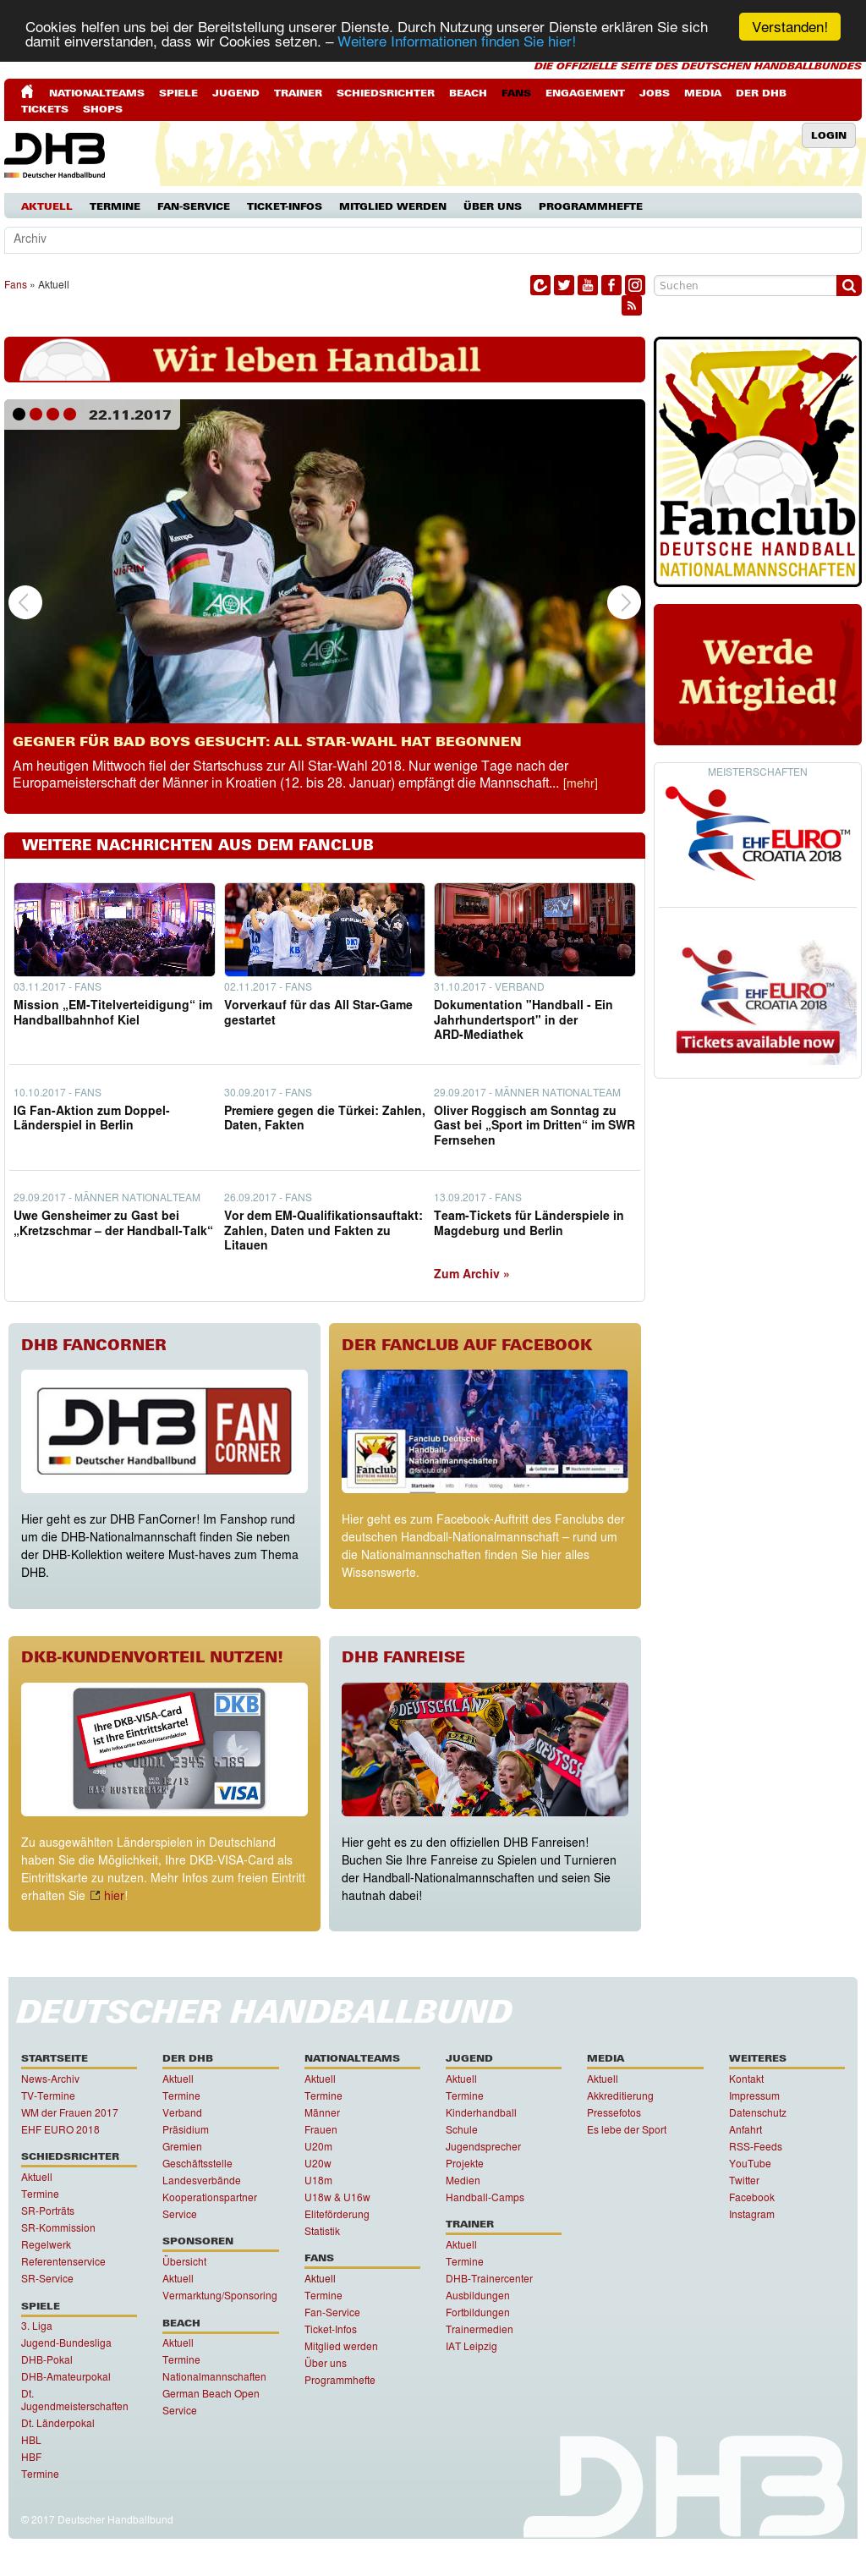 dhb handball 3. liga